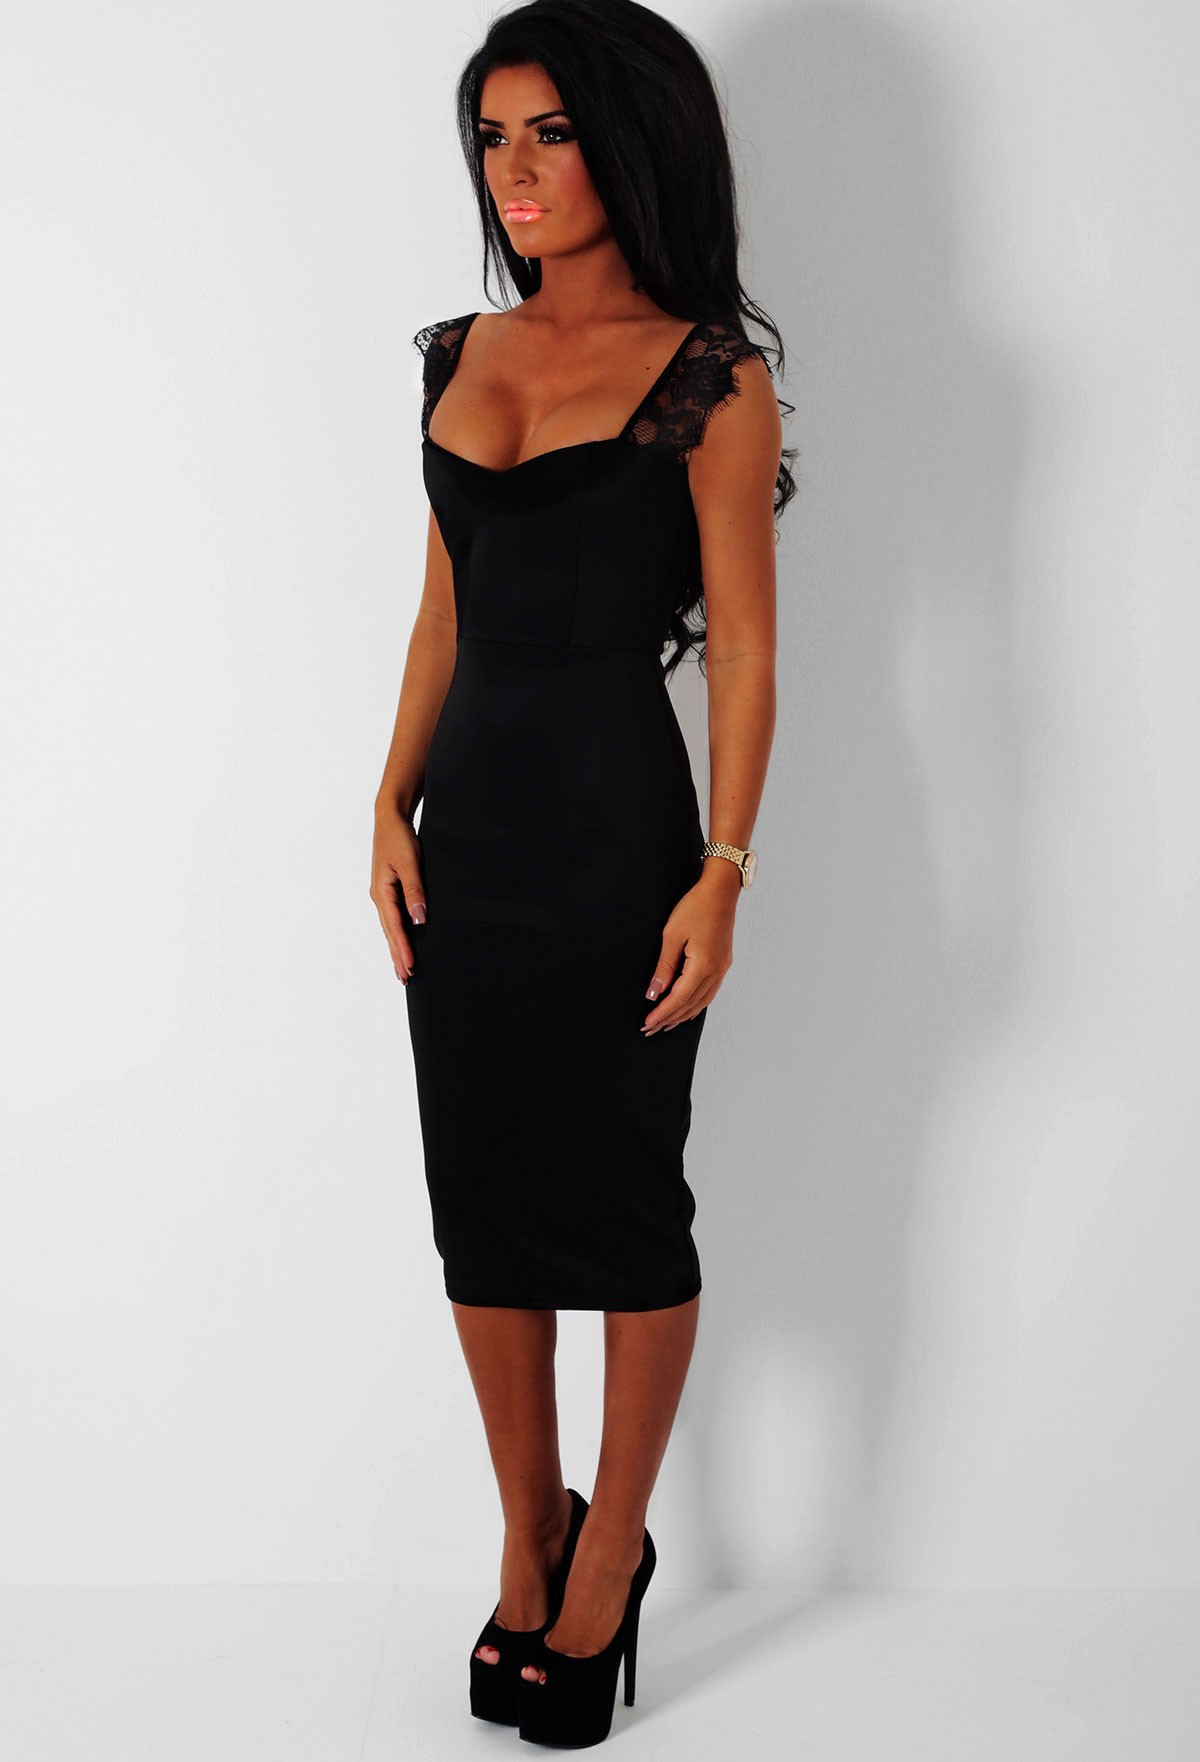 Black Midi Dress Picture Collection Dressedupgirl Com